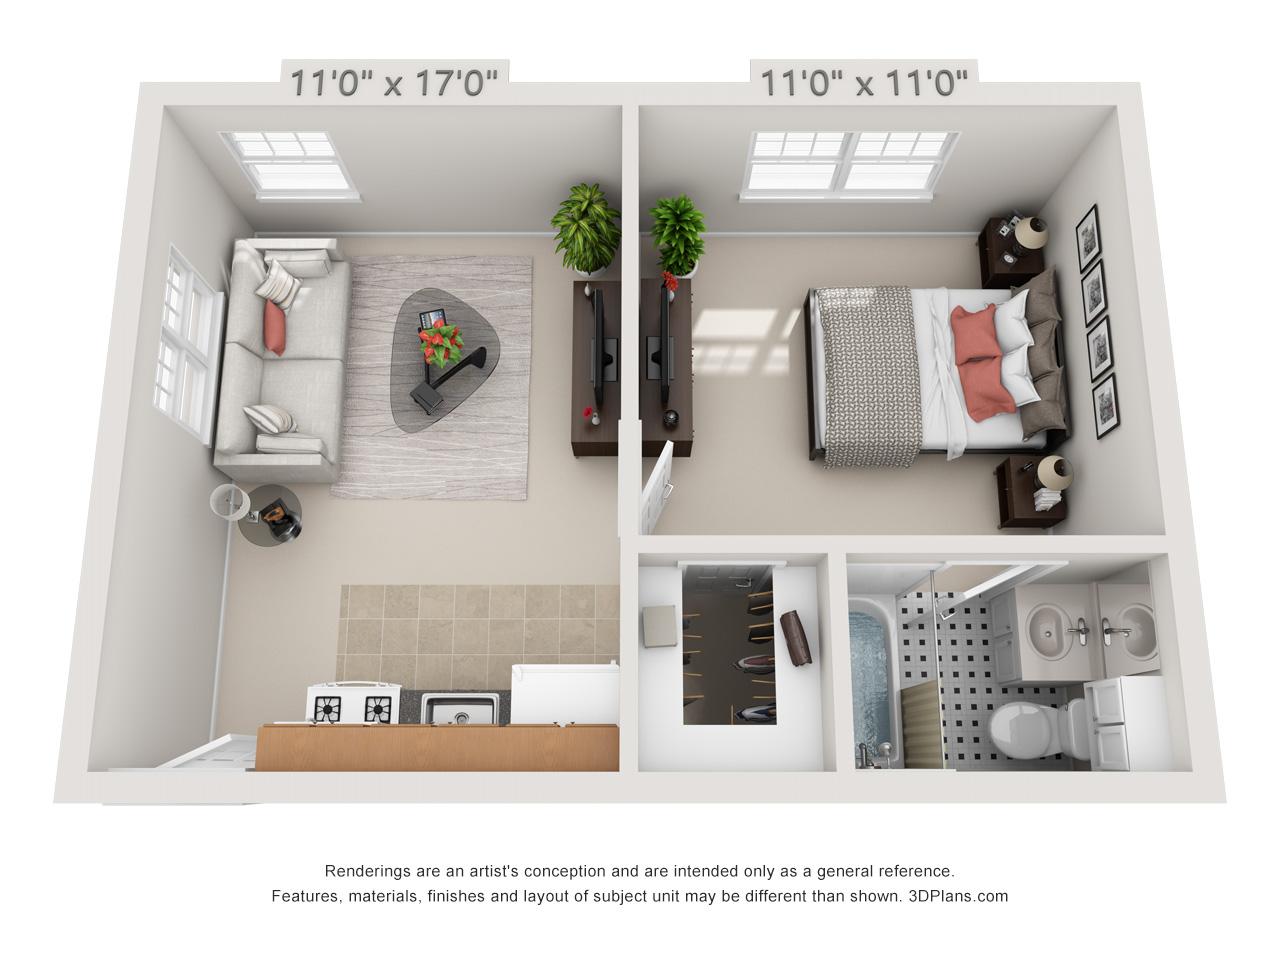 glenside apartments - 1 bedroom